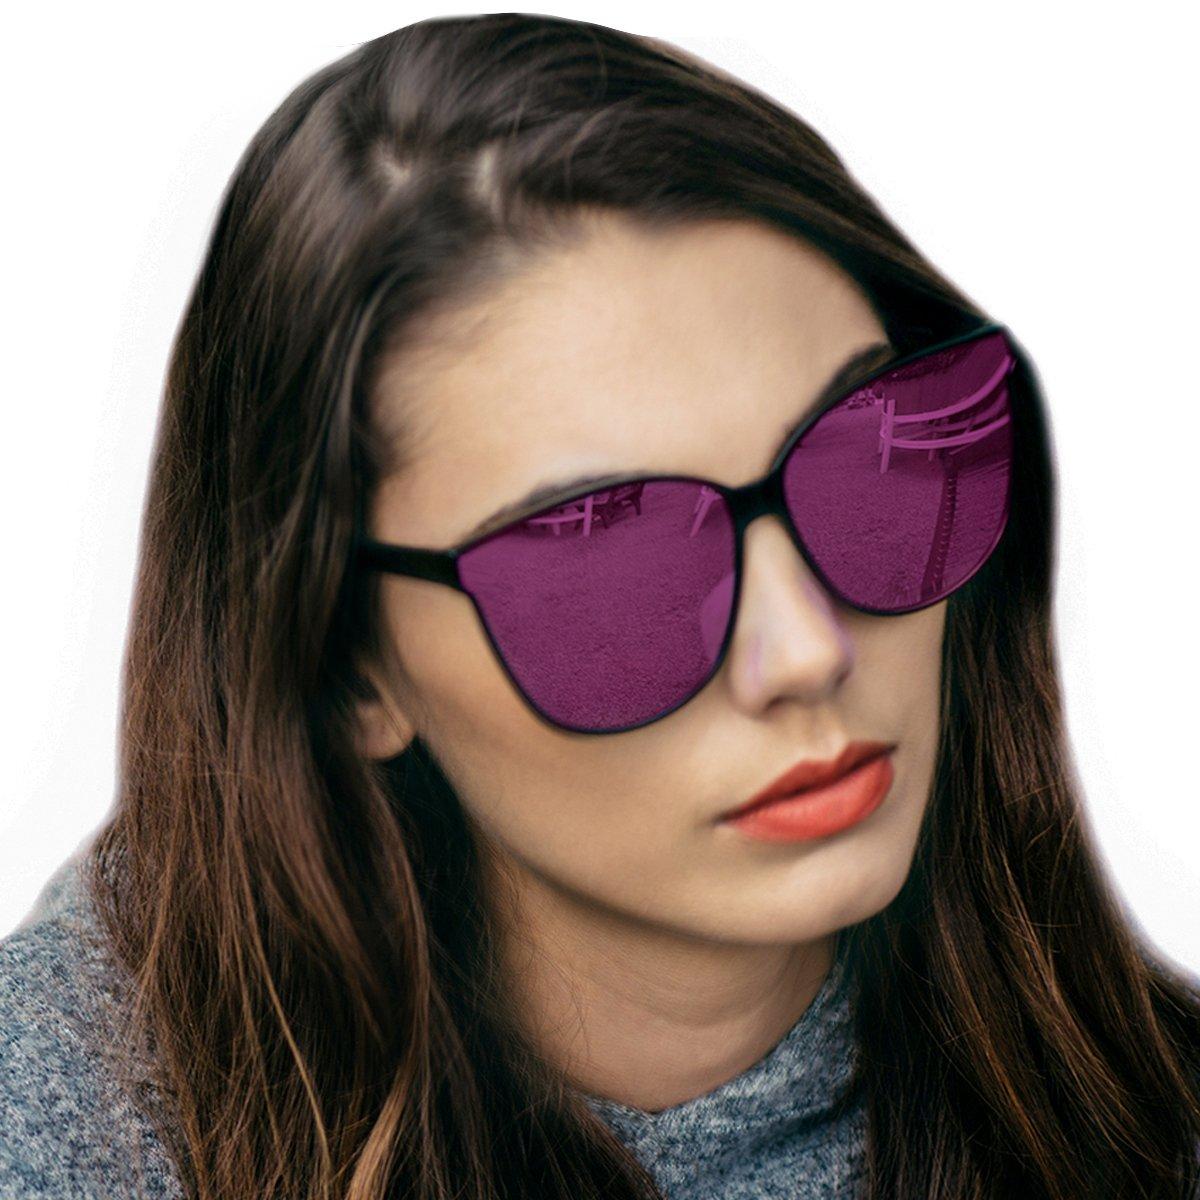 Cat Eyes Mirrored Sunglasses for Women, Polarized Oversized Fashion Vintage Eyewear for Driving Fishing UV400 Protection (Black2, Pink)